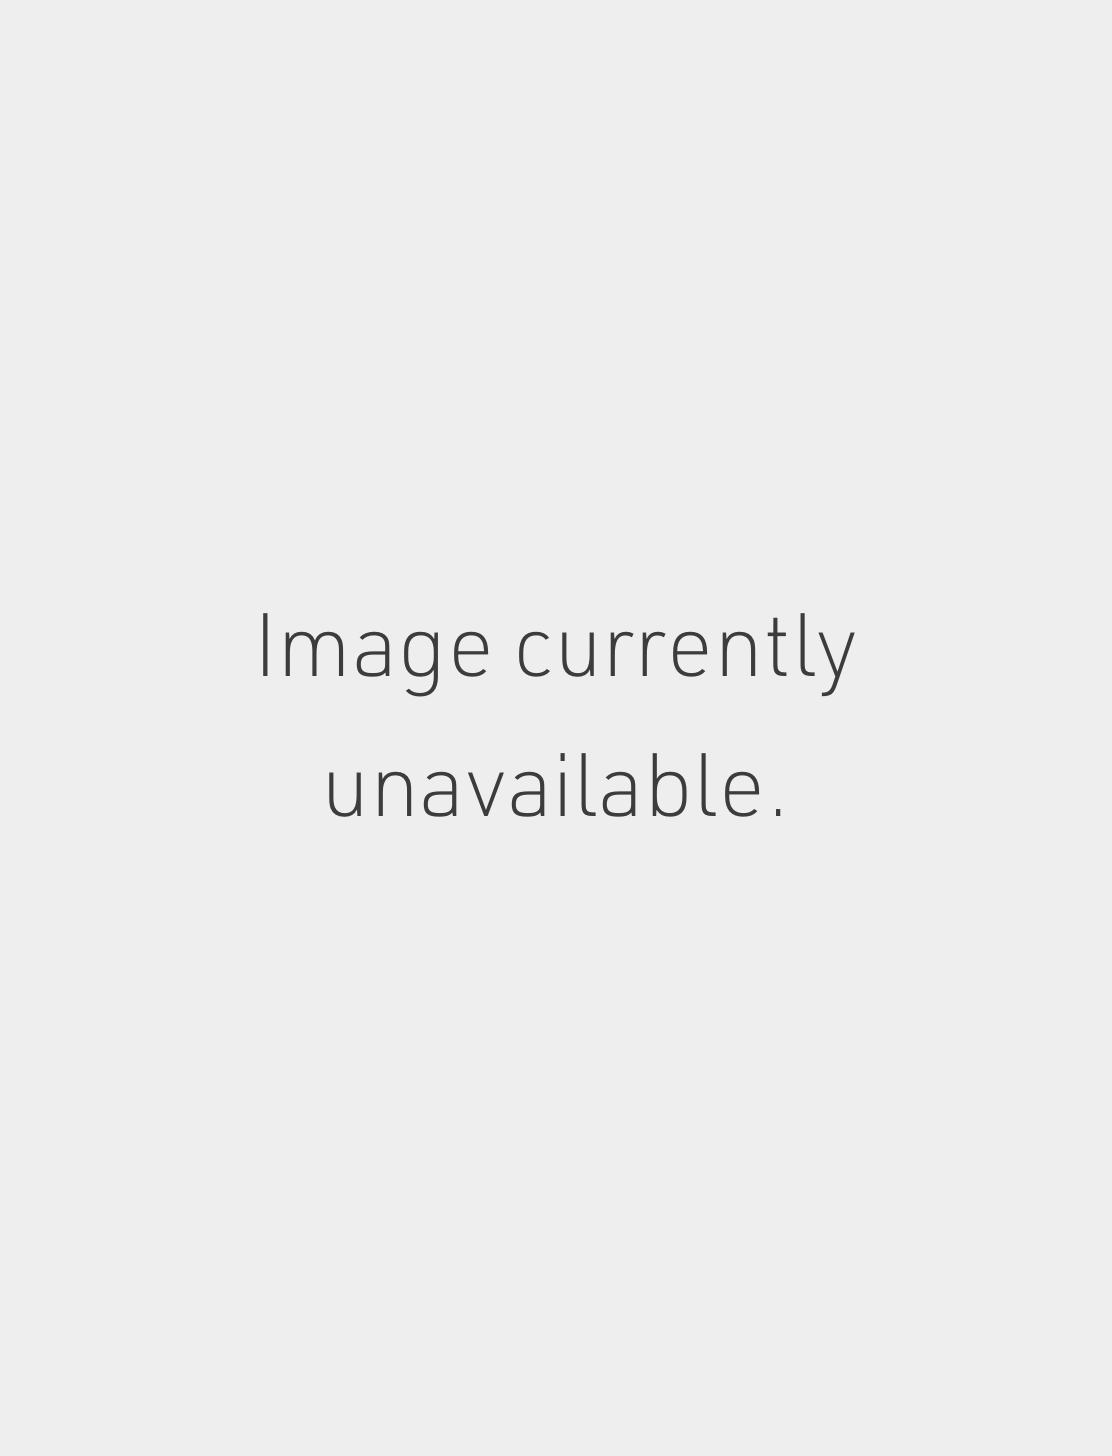 18k 7mm Square Diamond Bar Tash Thread - WHITE GOLD Image #1